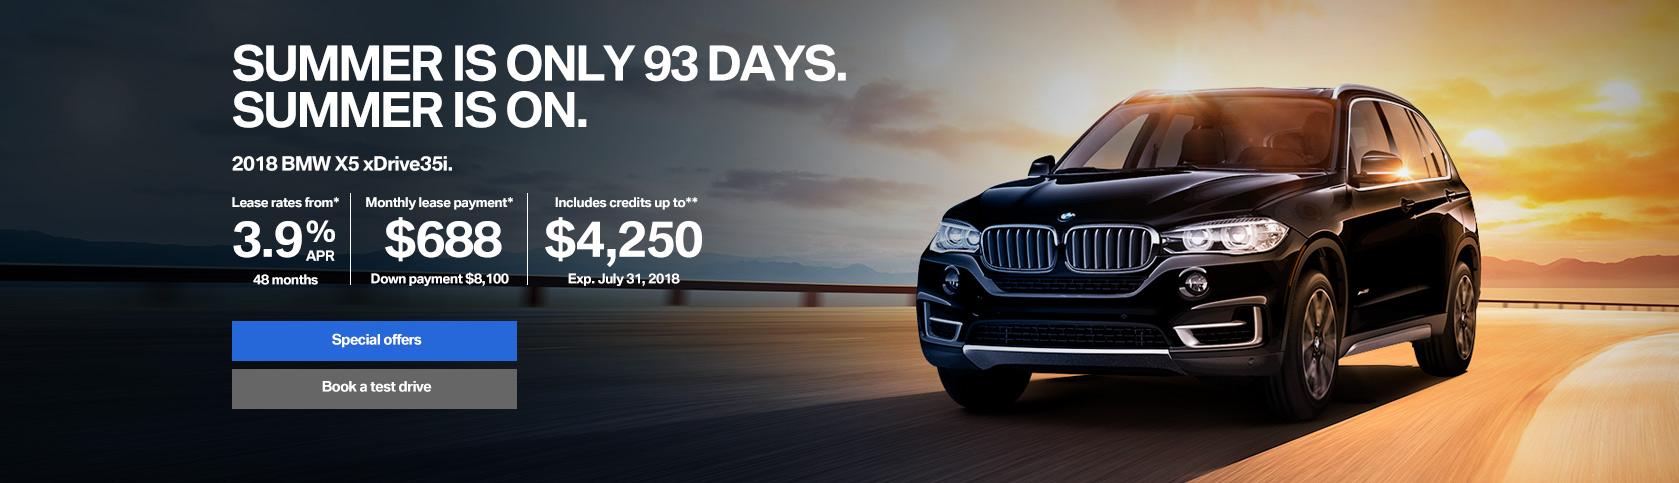 2018_BMW_JulDAG_X5_Banner_1679x483_GTA